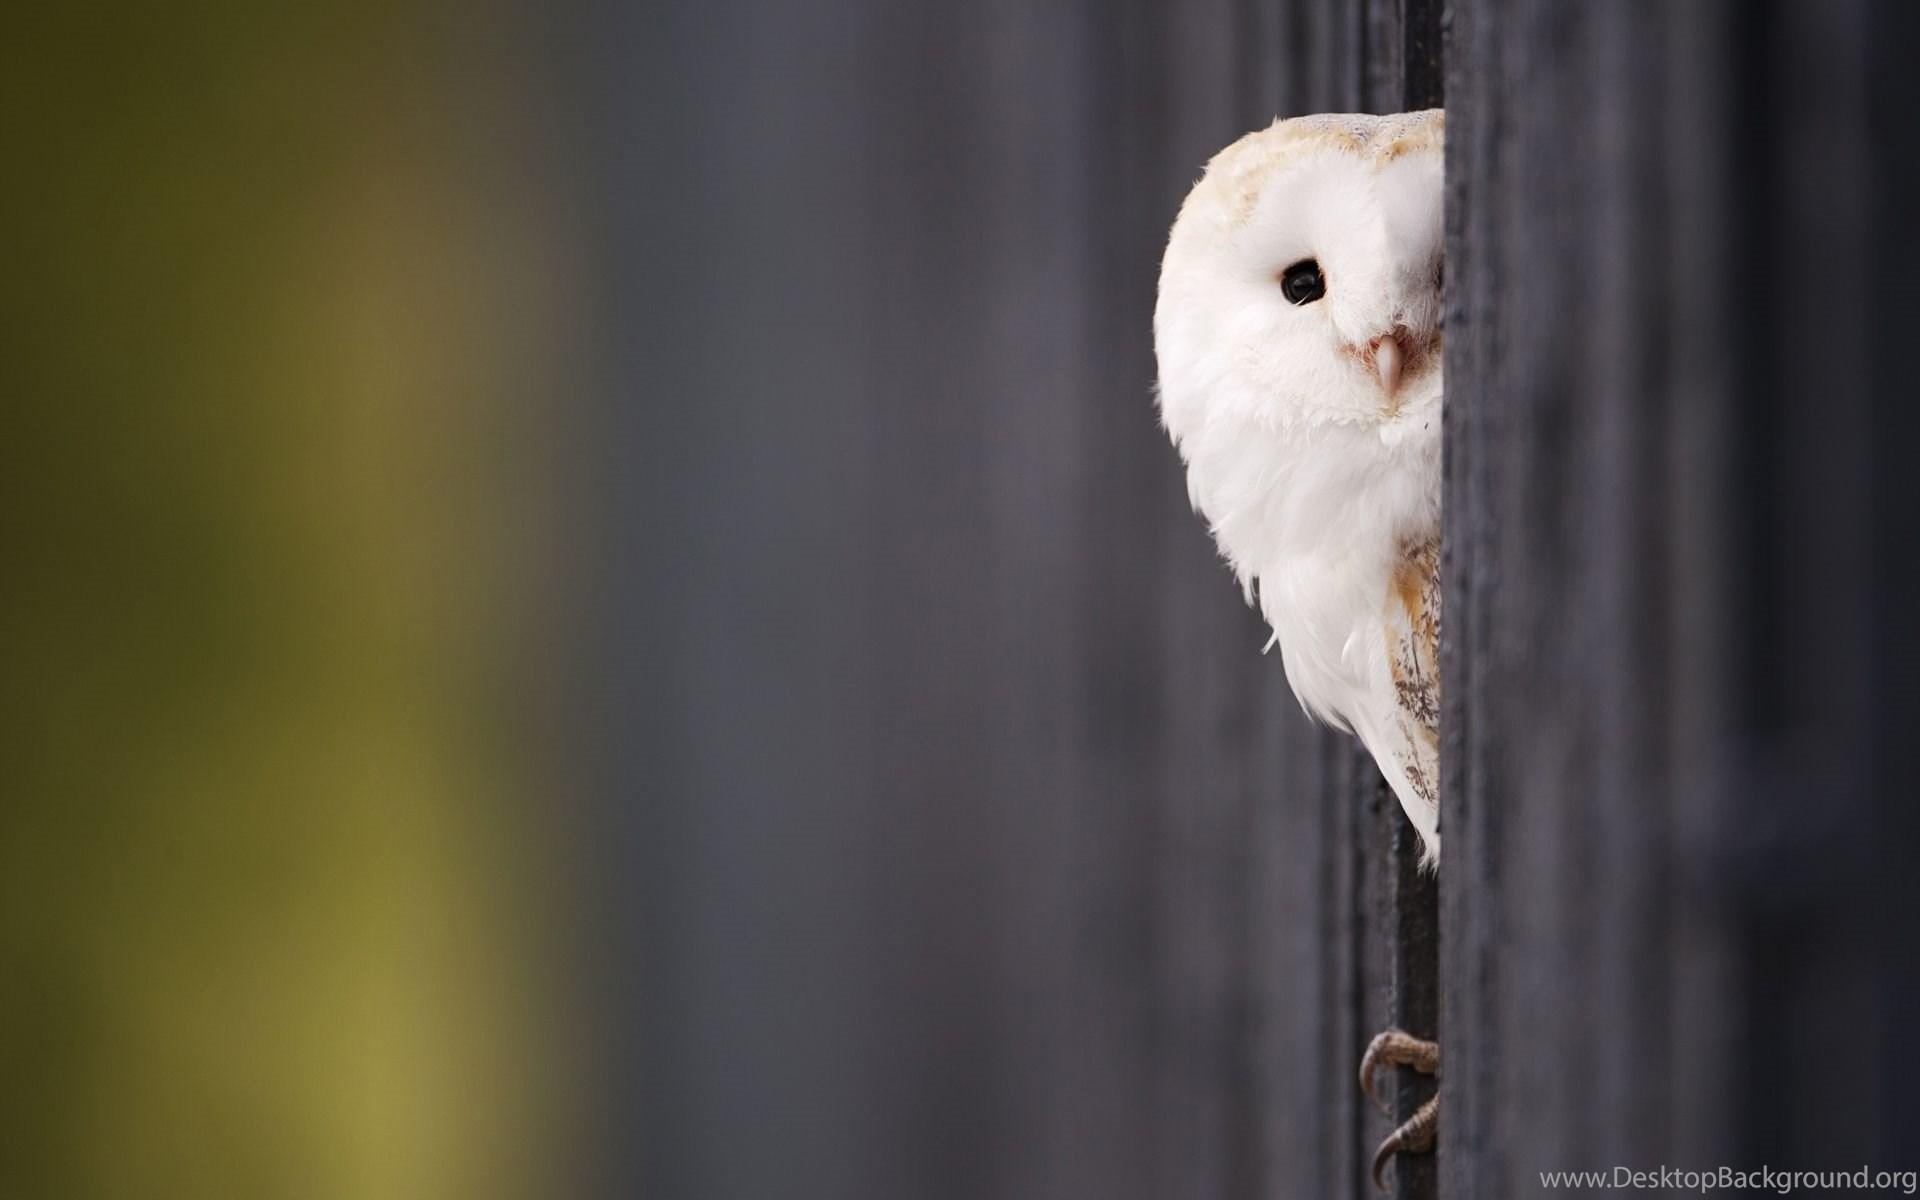 Cute White Baby Owl Wallpaper Desktop Background